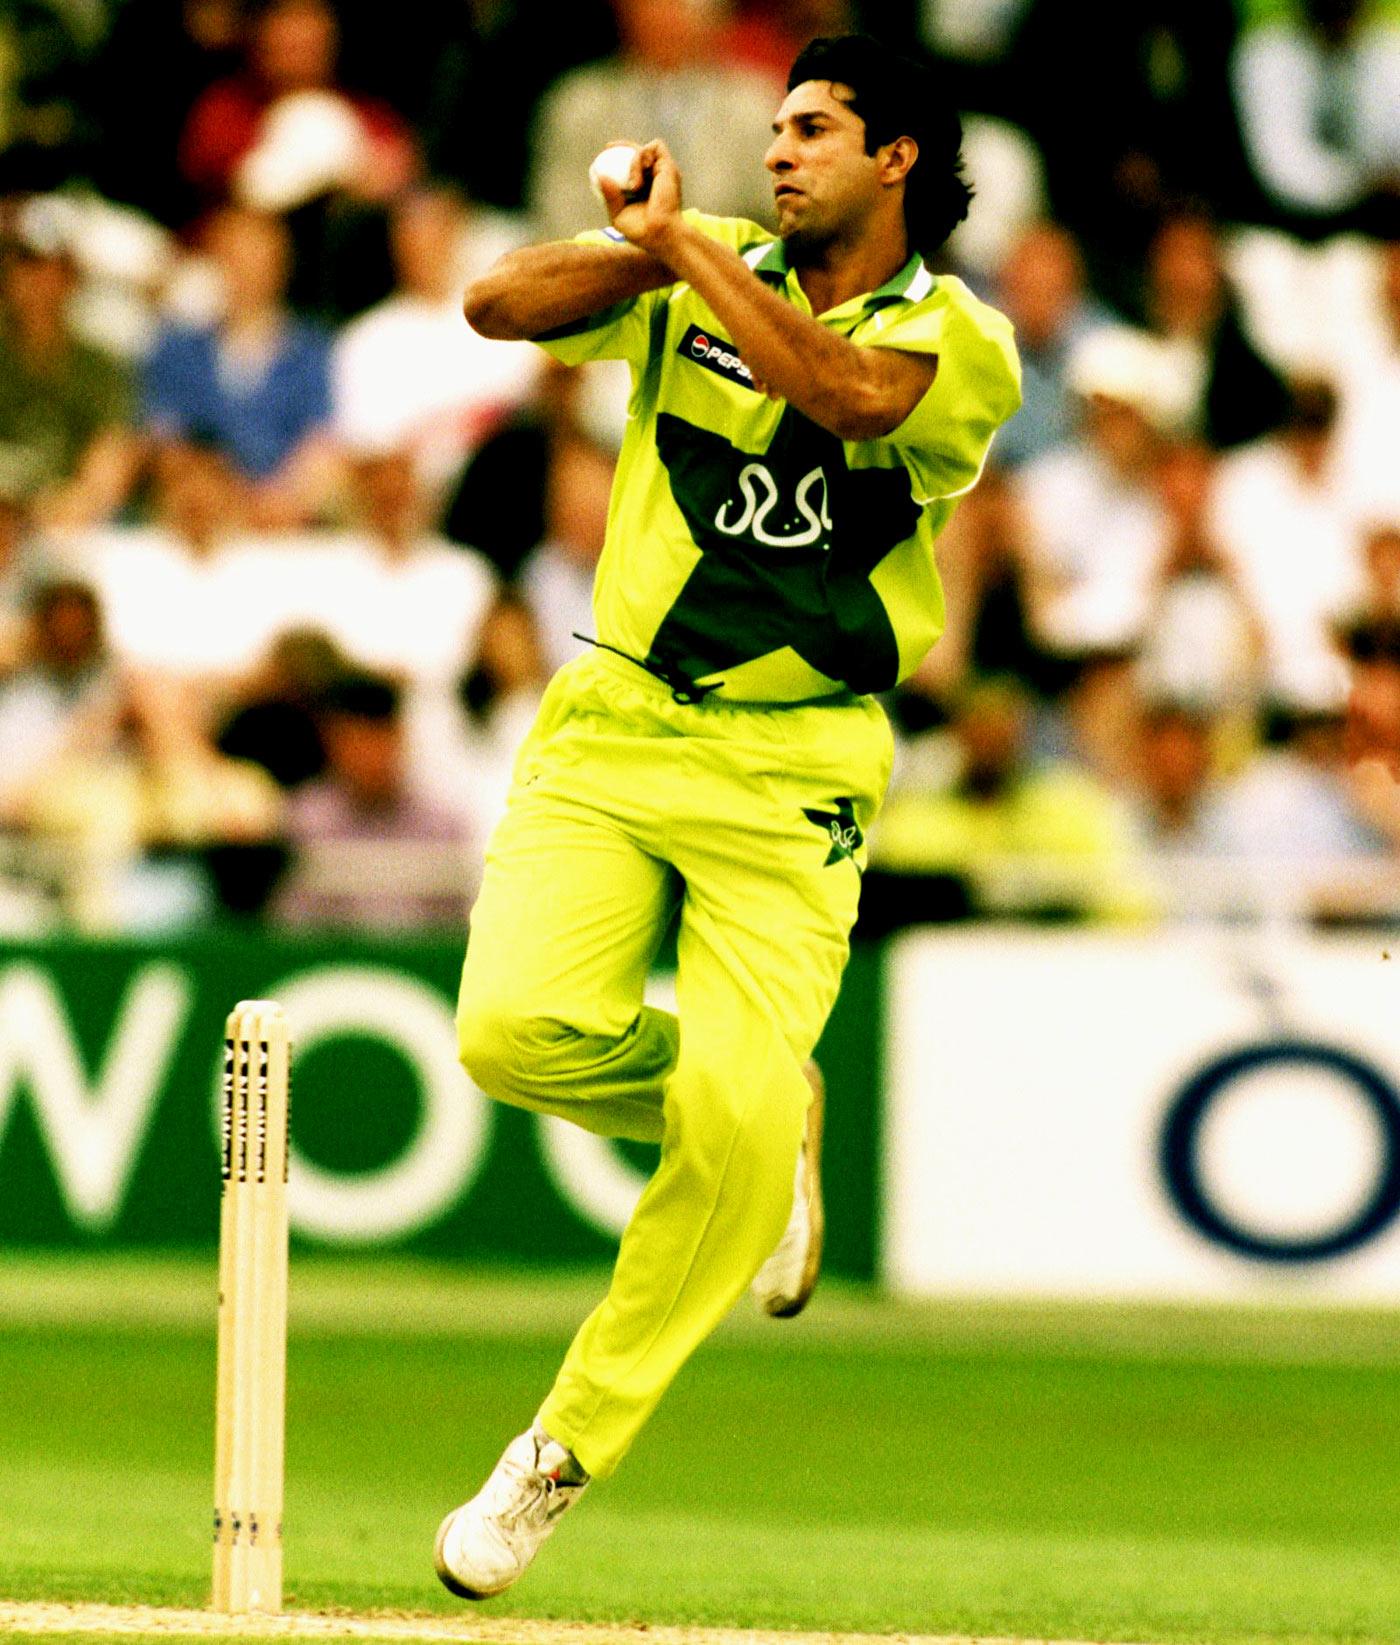 Sensational in 60 balls: Akram's genius shone through in ODIs as it did in Tests